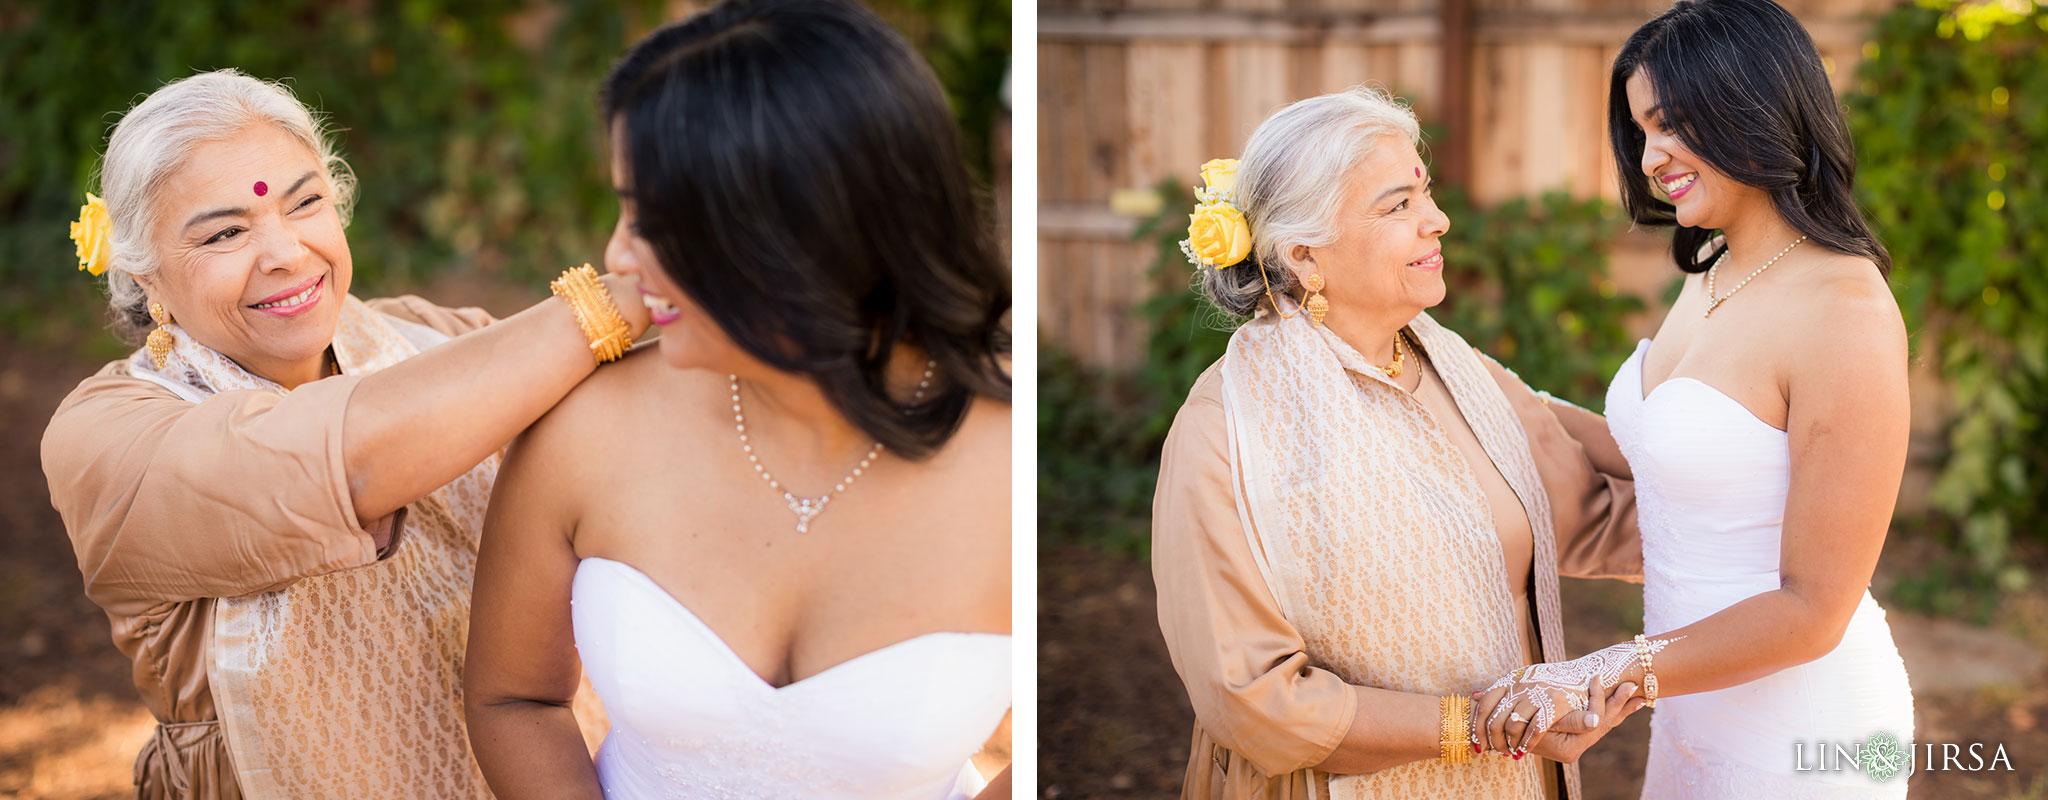 04 Orange County Indian Bride Wedding Photography